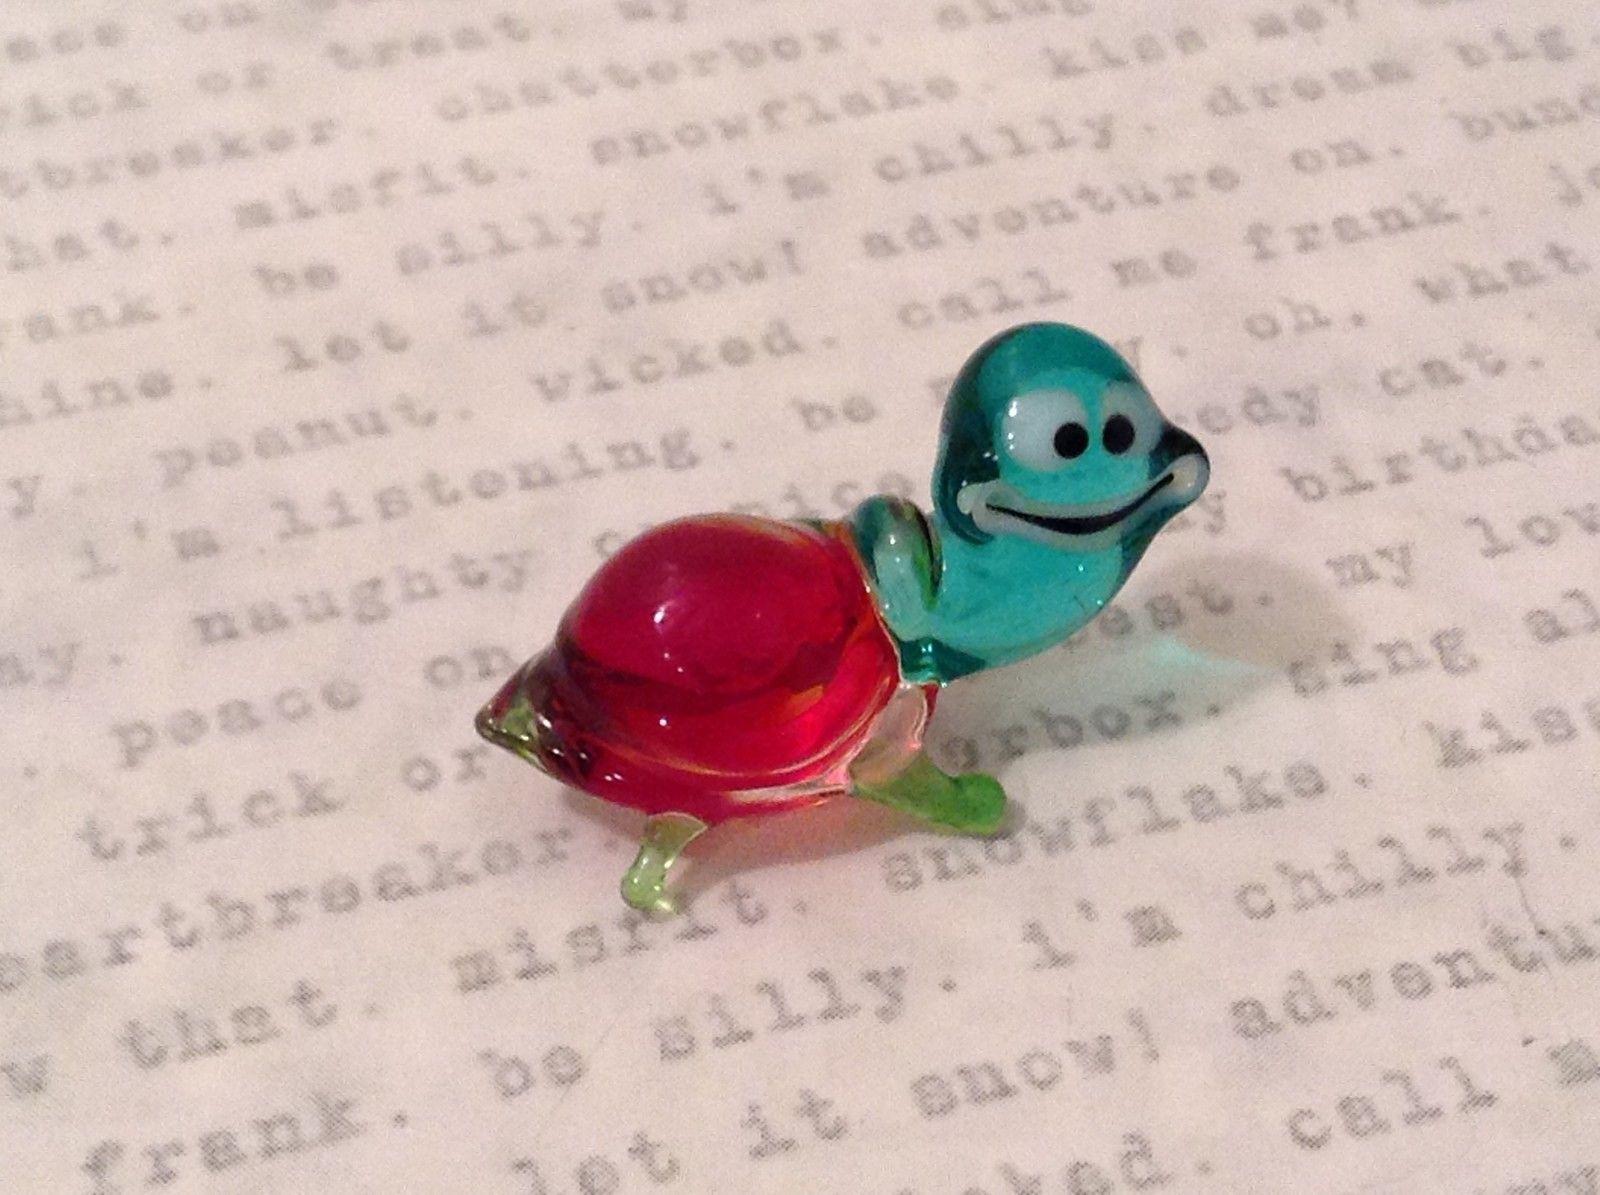 Micro miniature hand blown glass figurine USA blue green w red shell turtle NIB